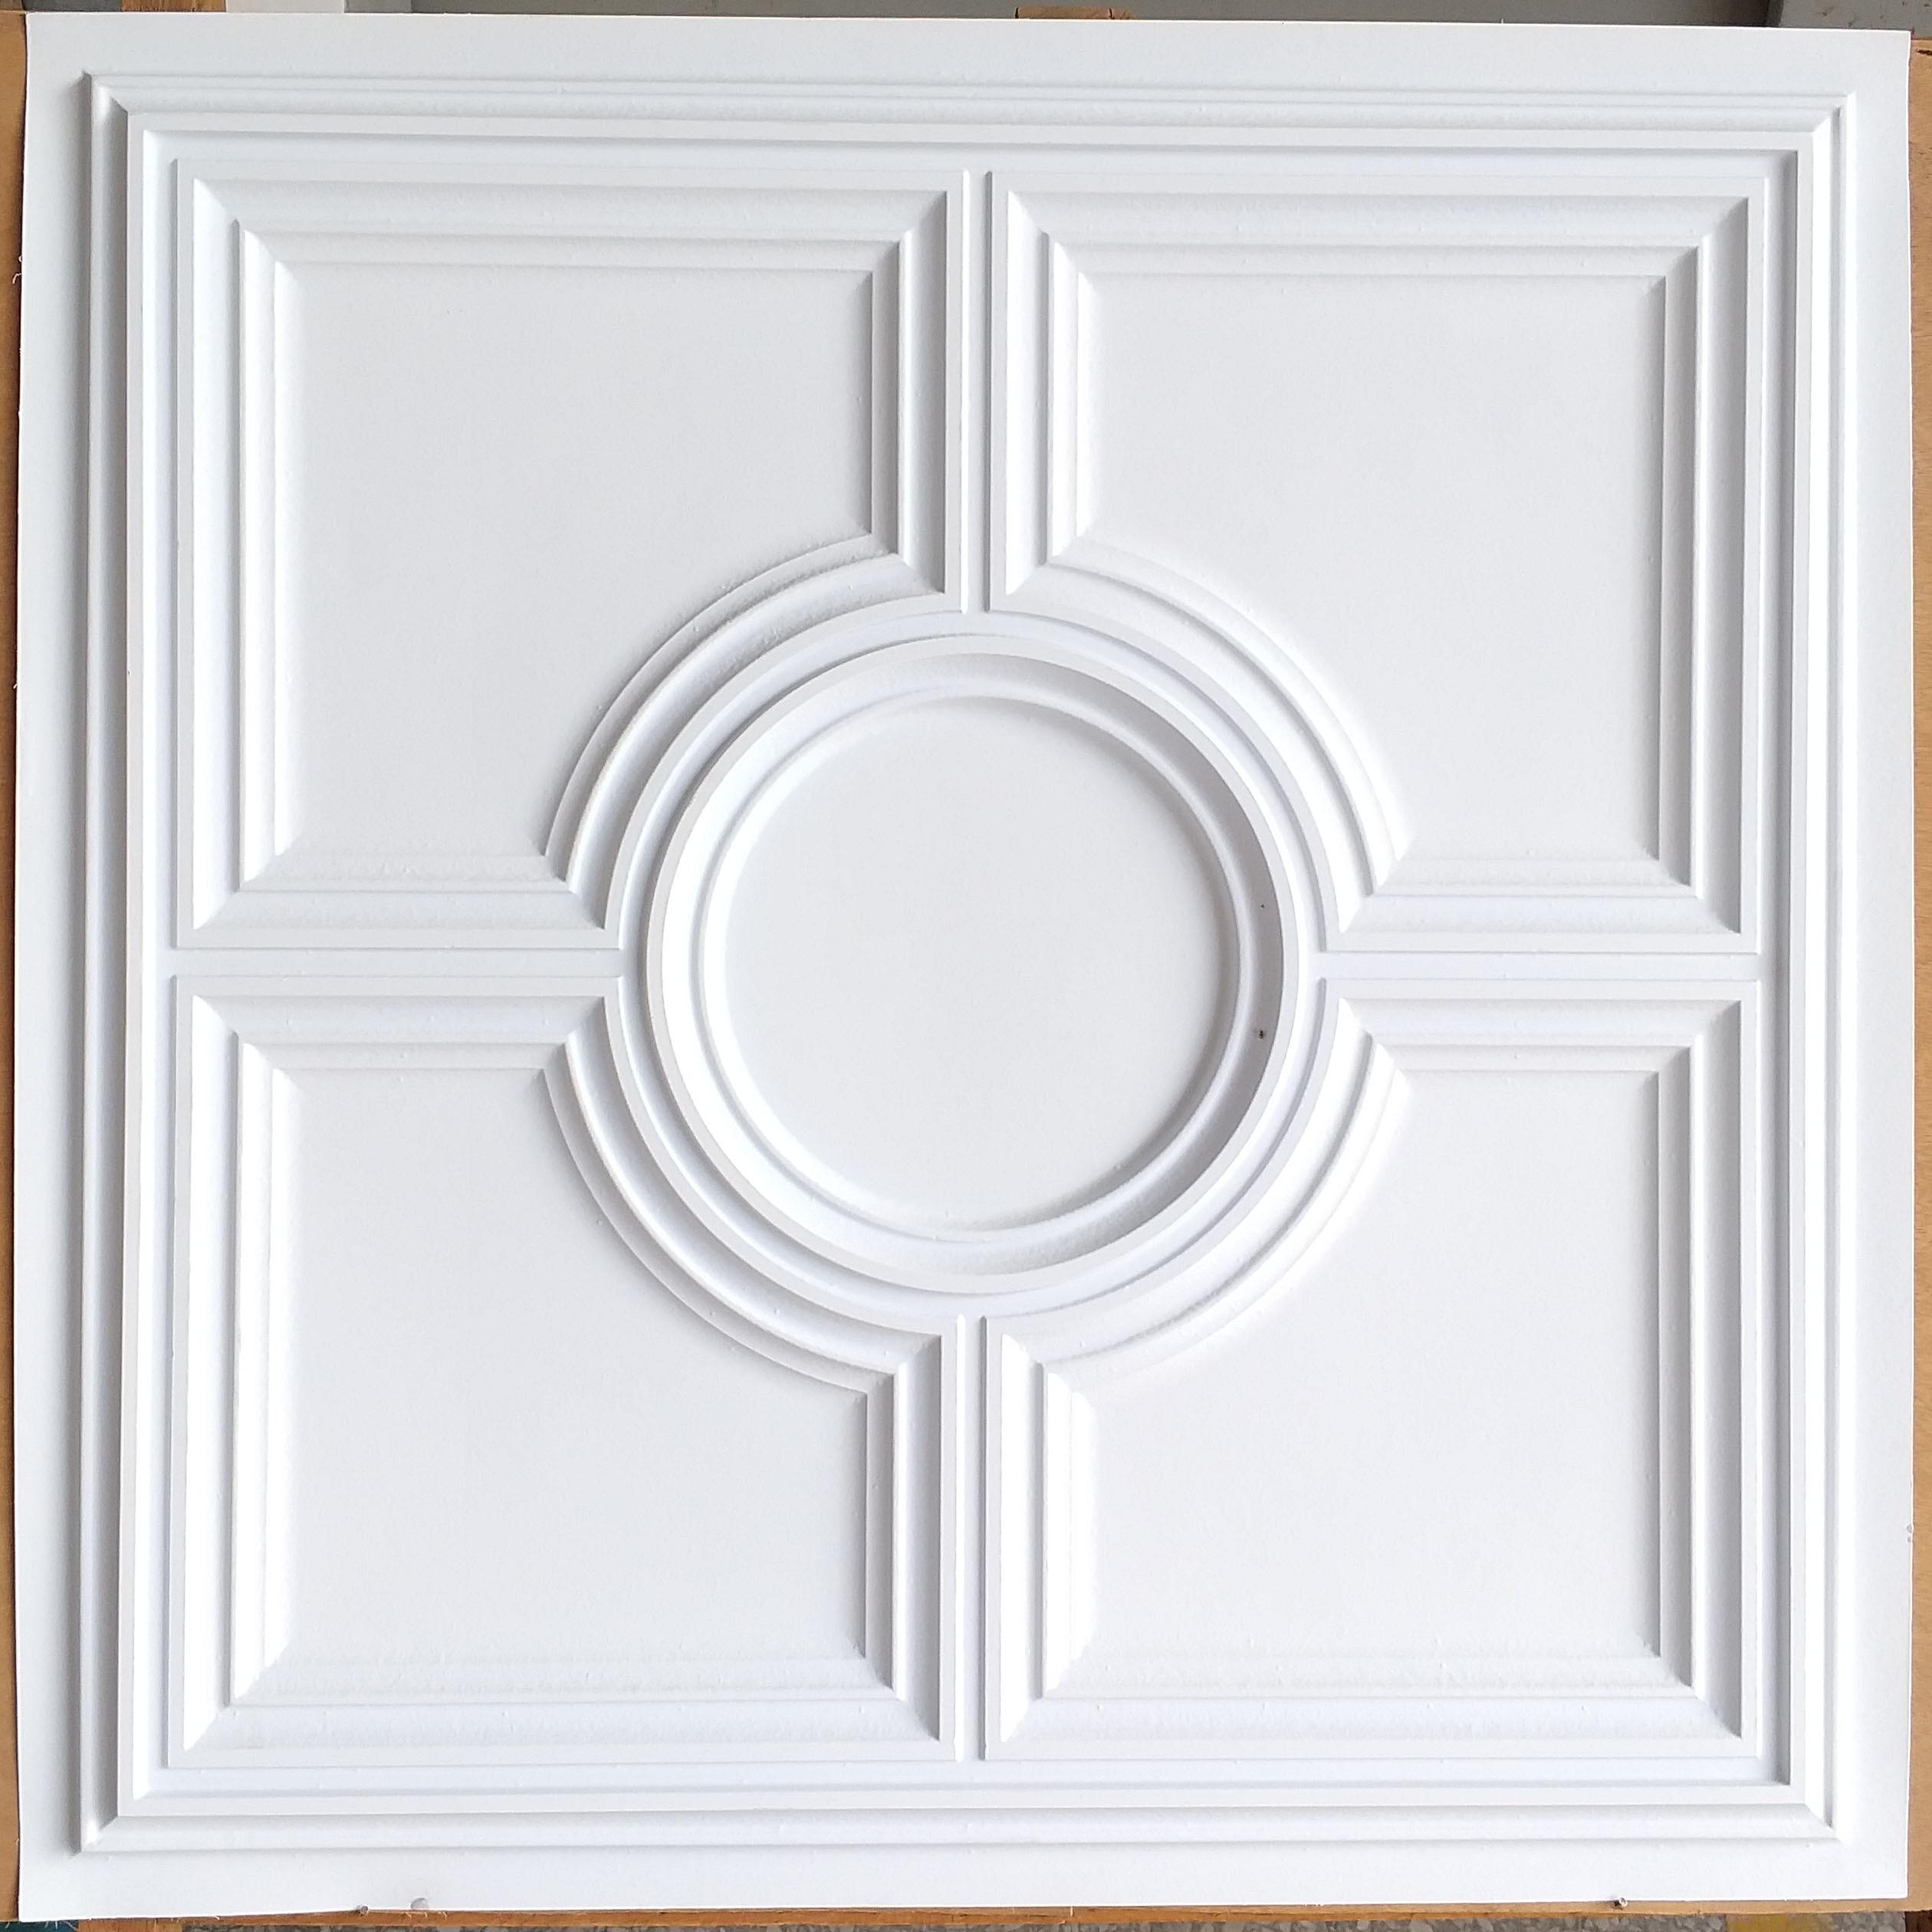 Suspended Ceiling tiles faux white matt cafe pub restaurant well ceiling panels PL37